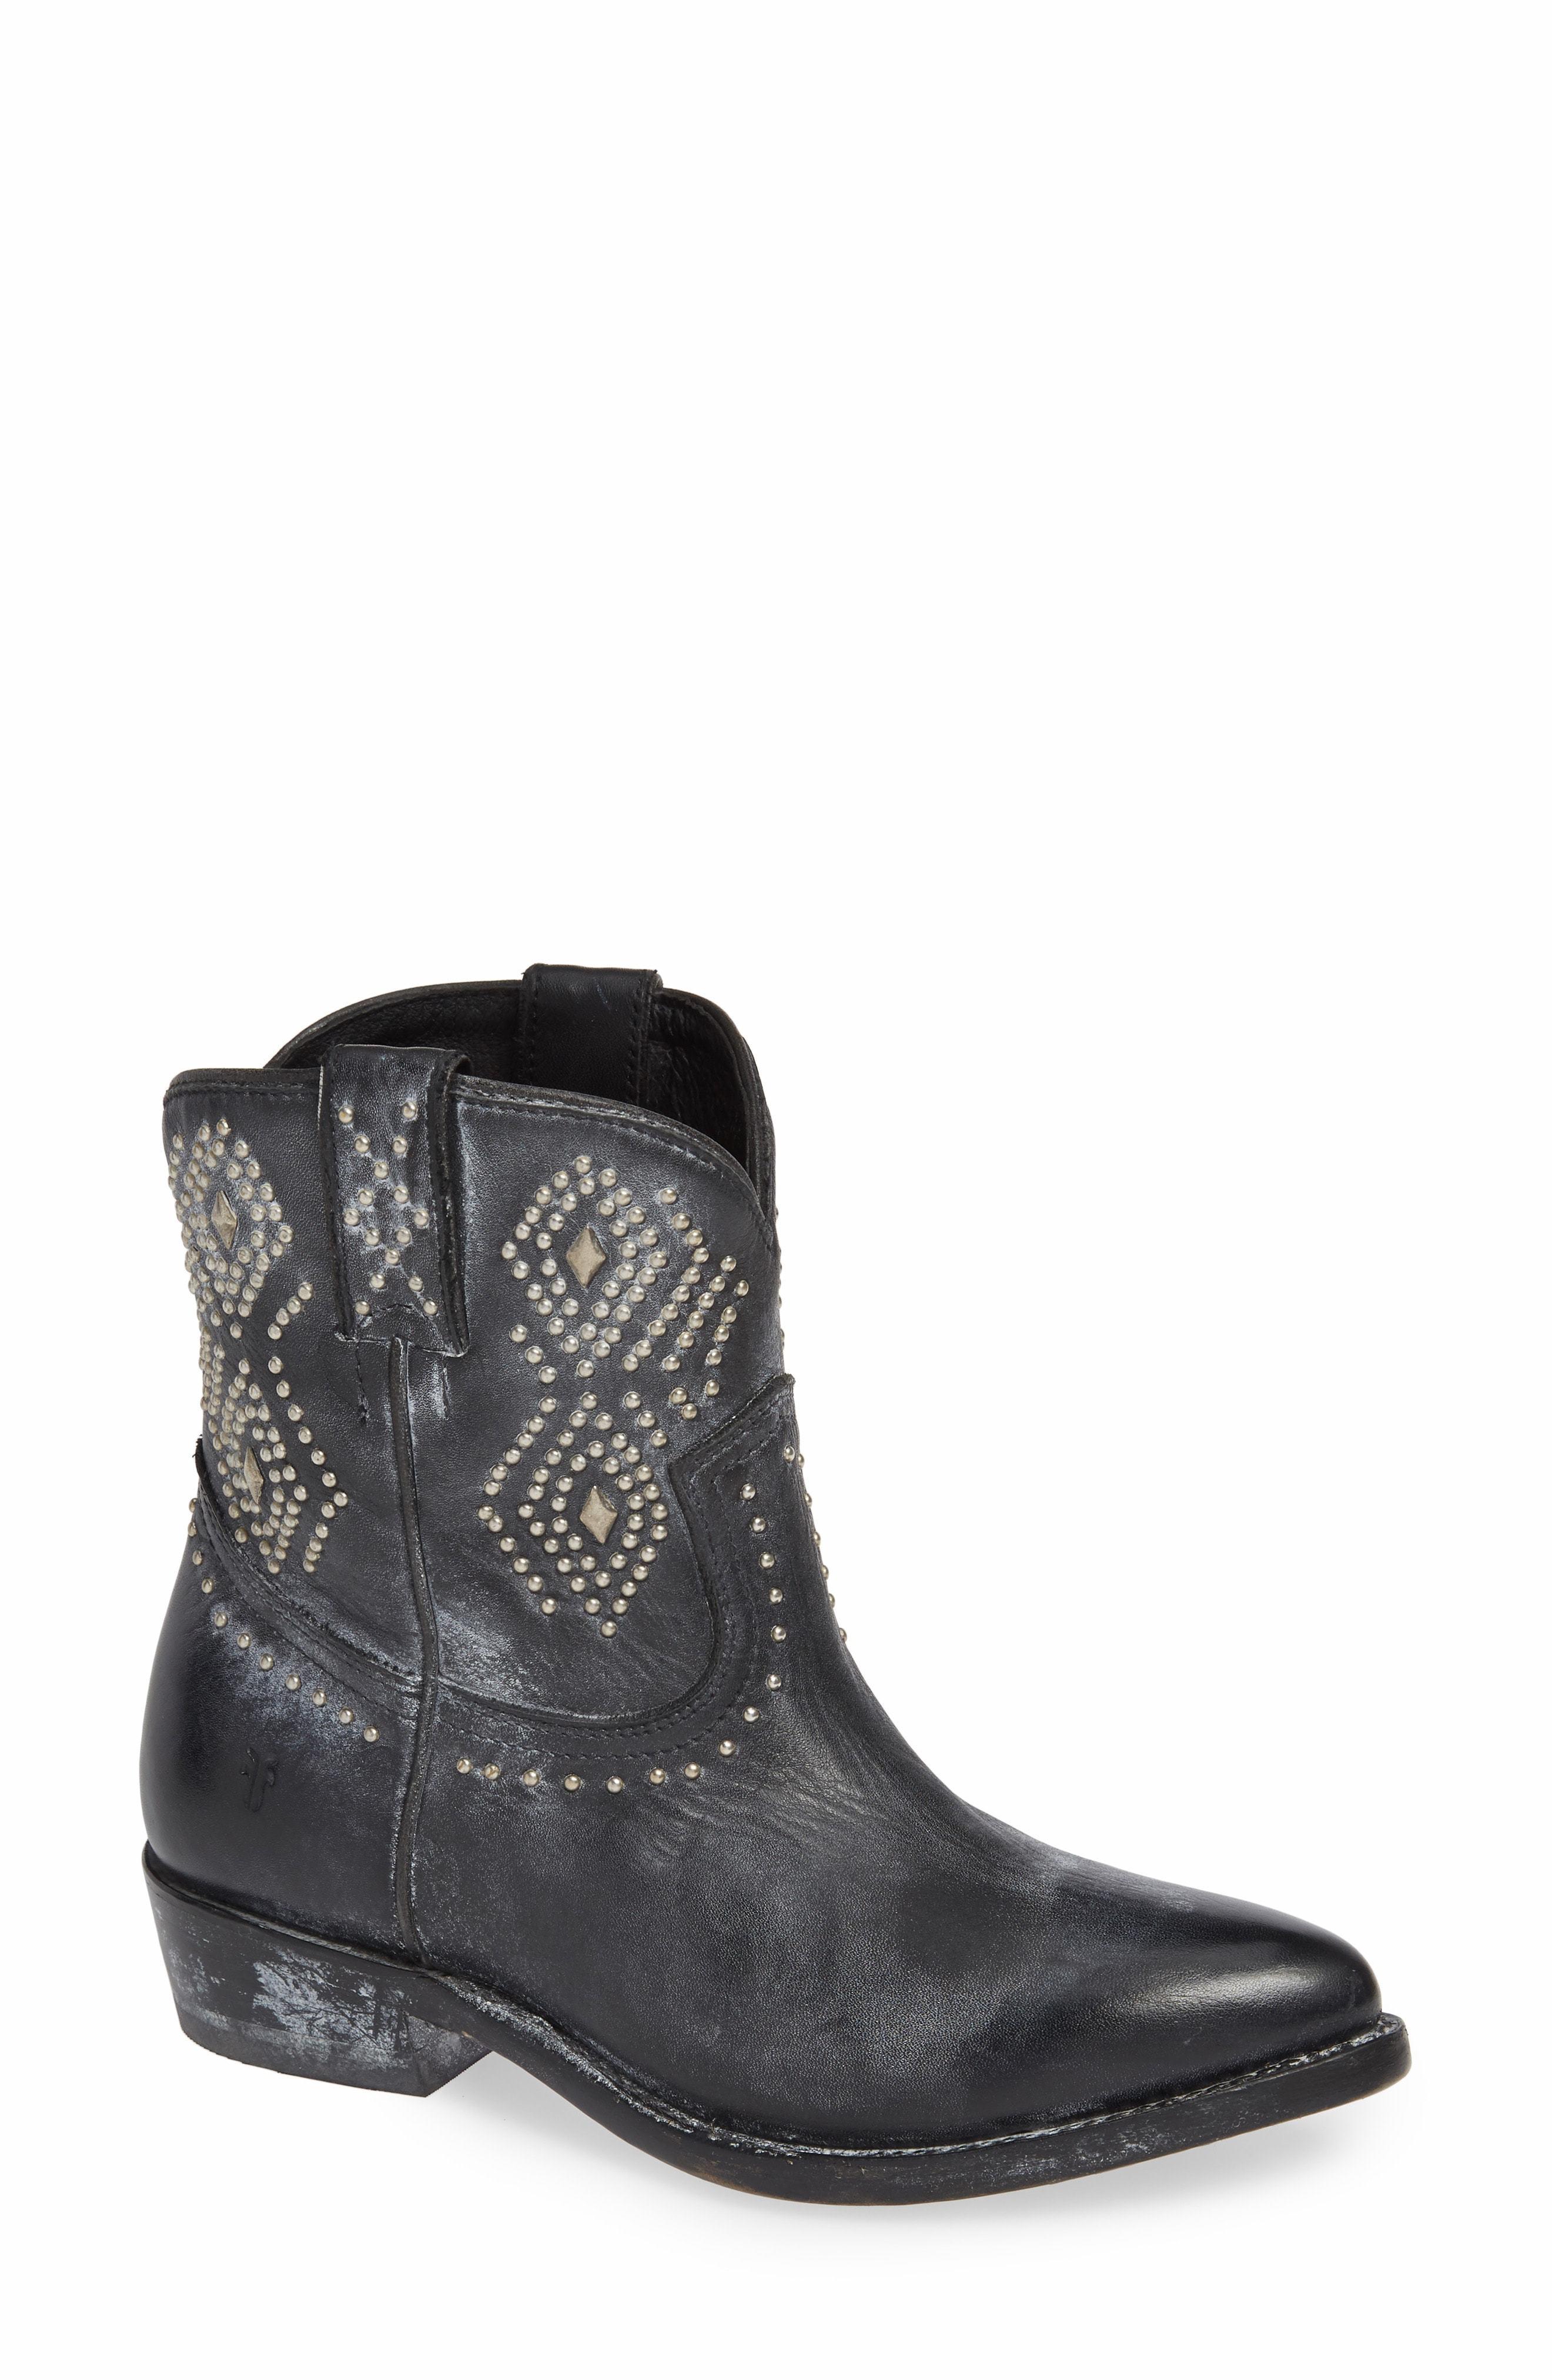 763ea7034ad Billy Stud Short Western Boot